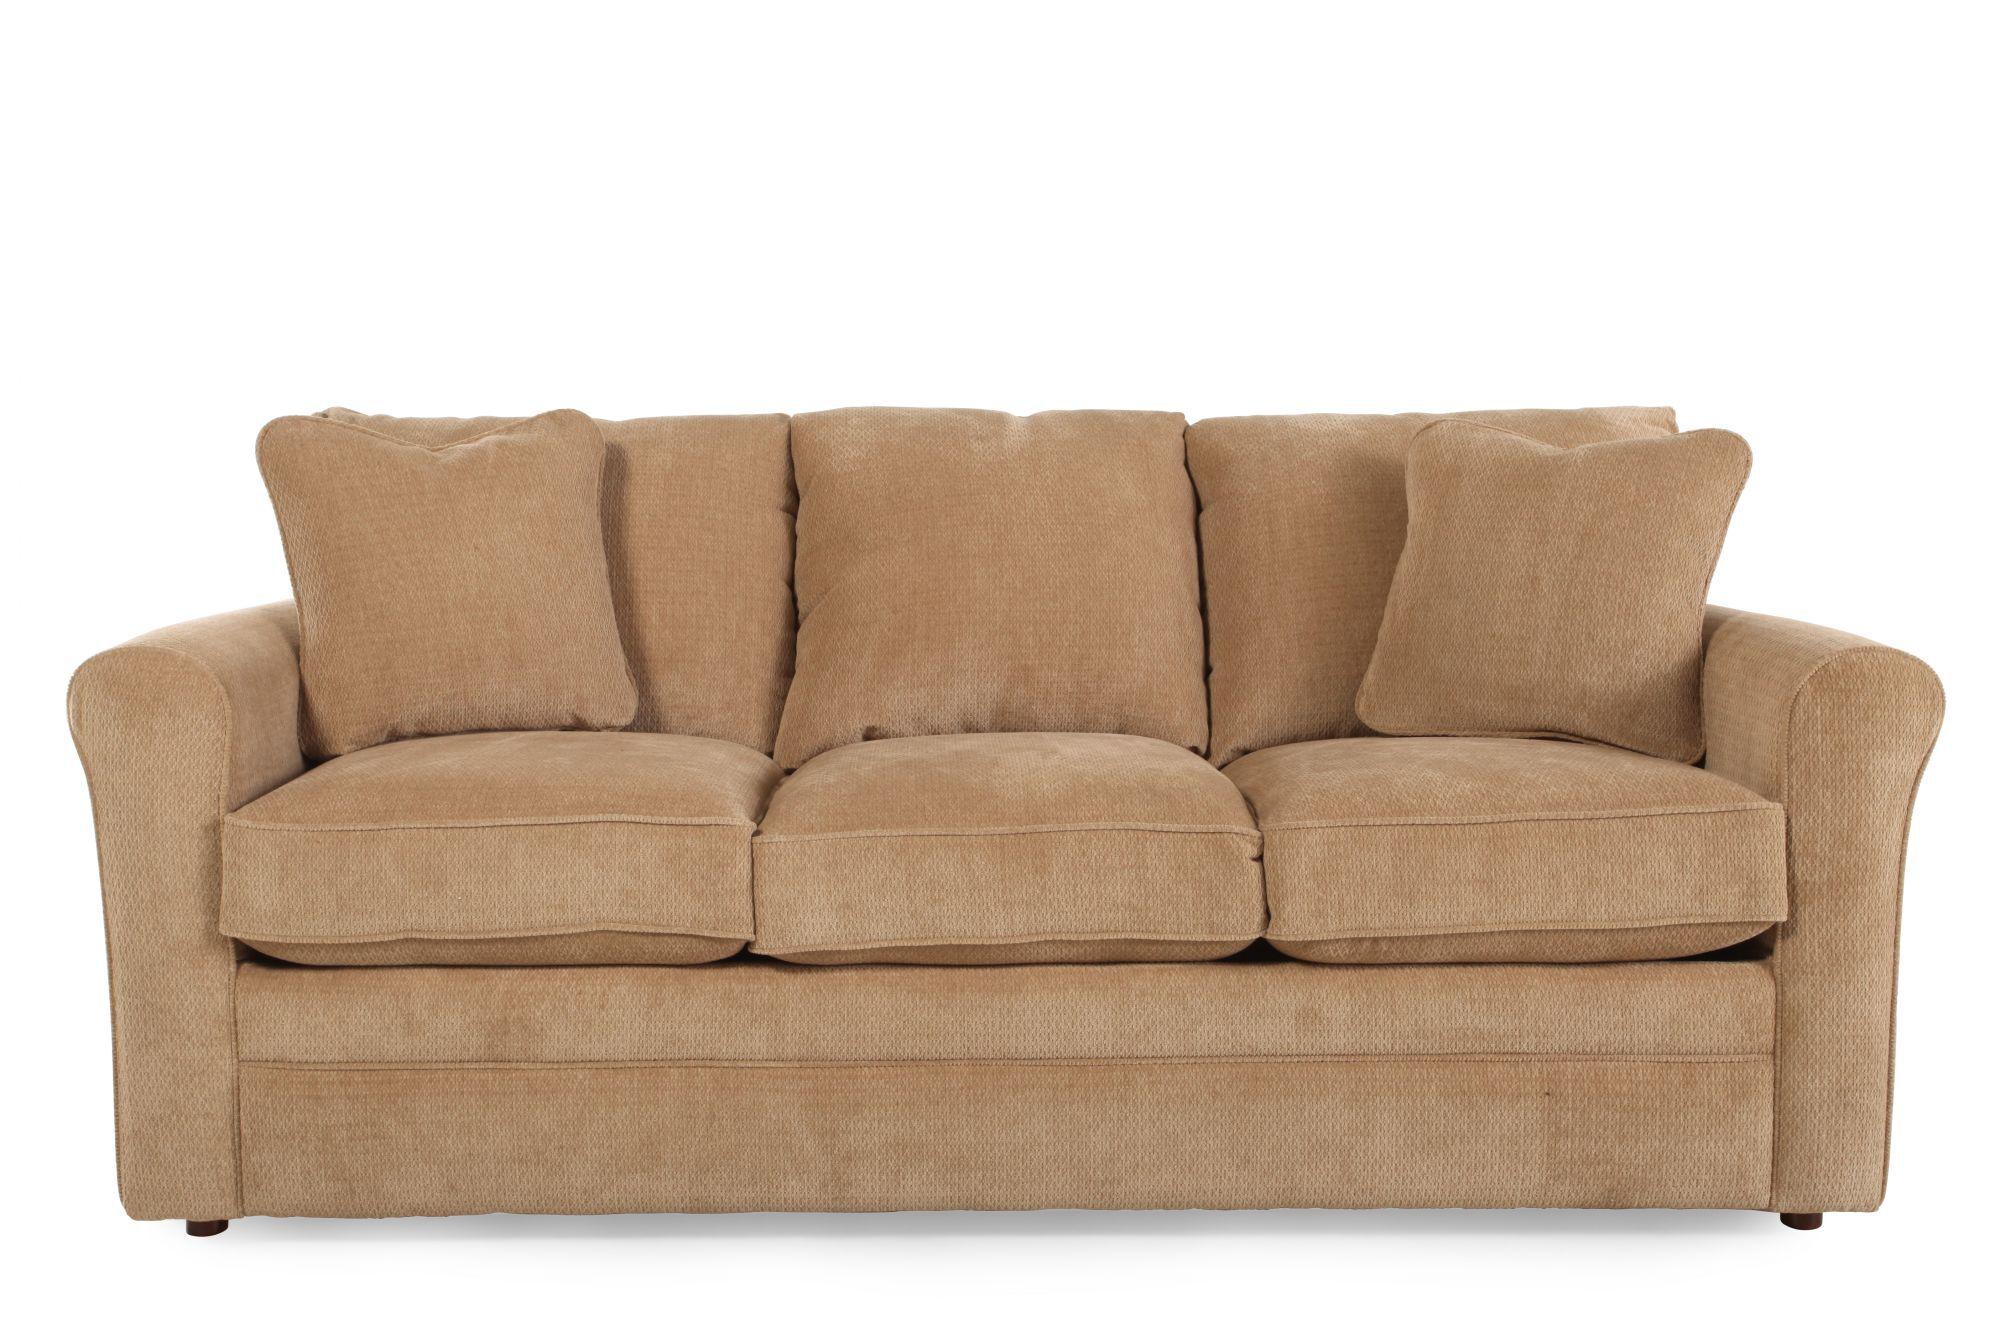 "Traditional 73.5"" Full Sleeper Sofa in Dune   Mathis ..."